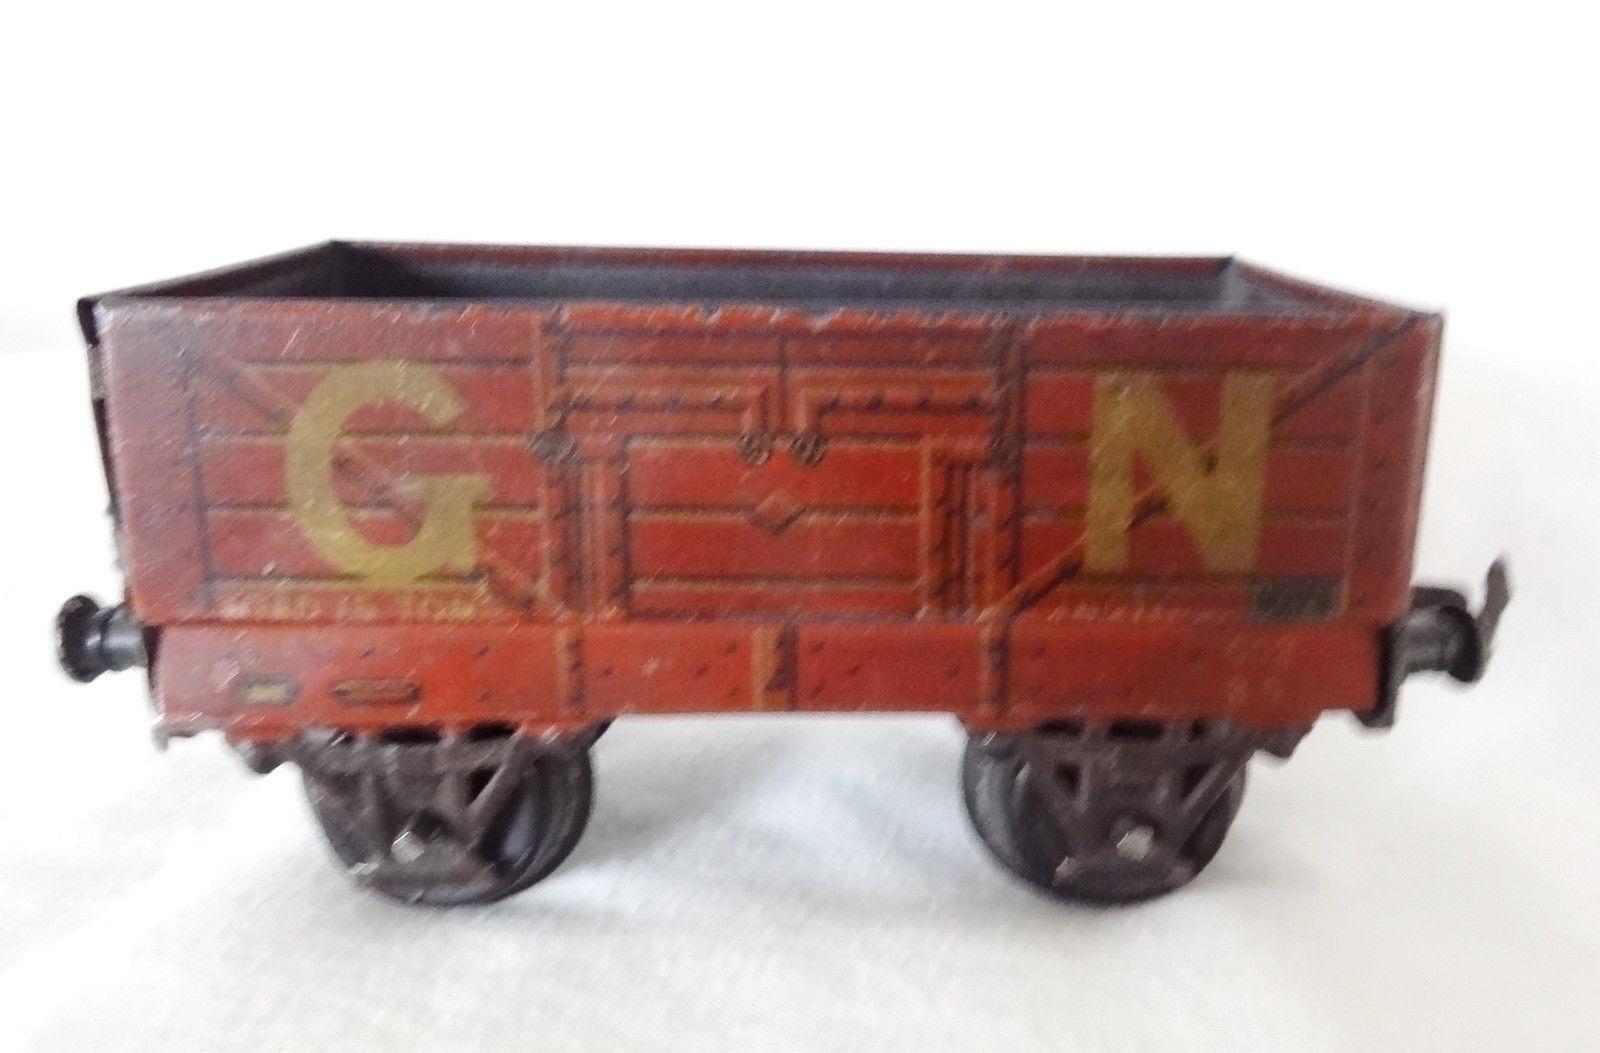 001T Vintage Bing O Gauge GN Open Wagon